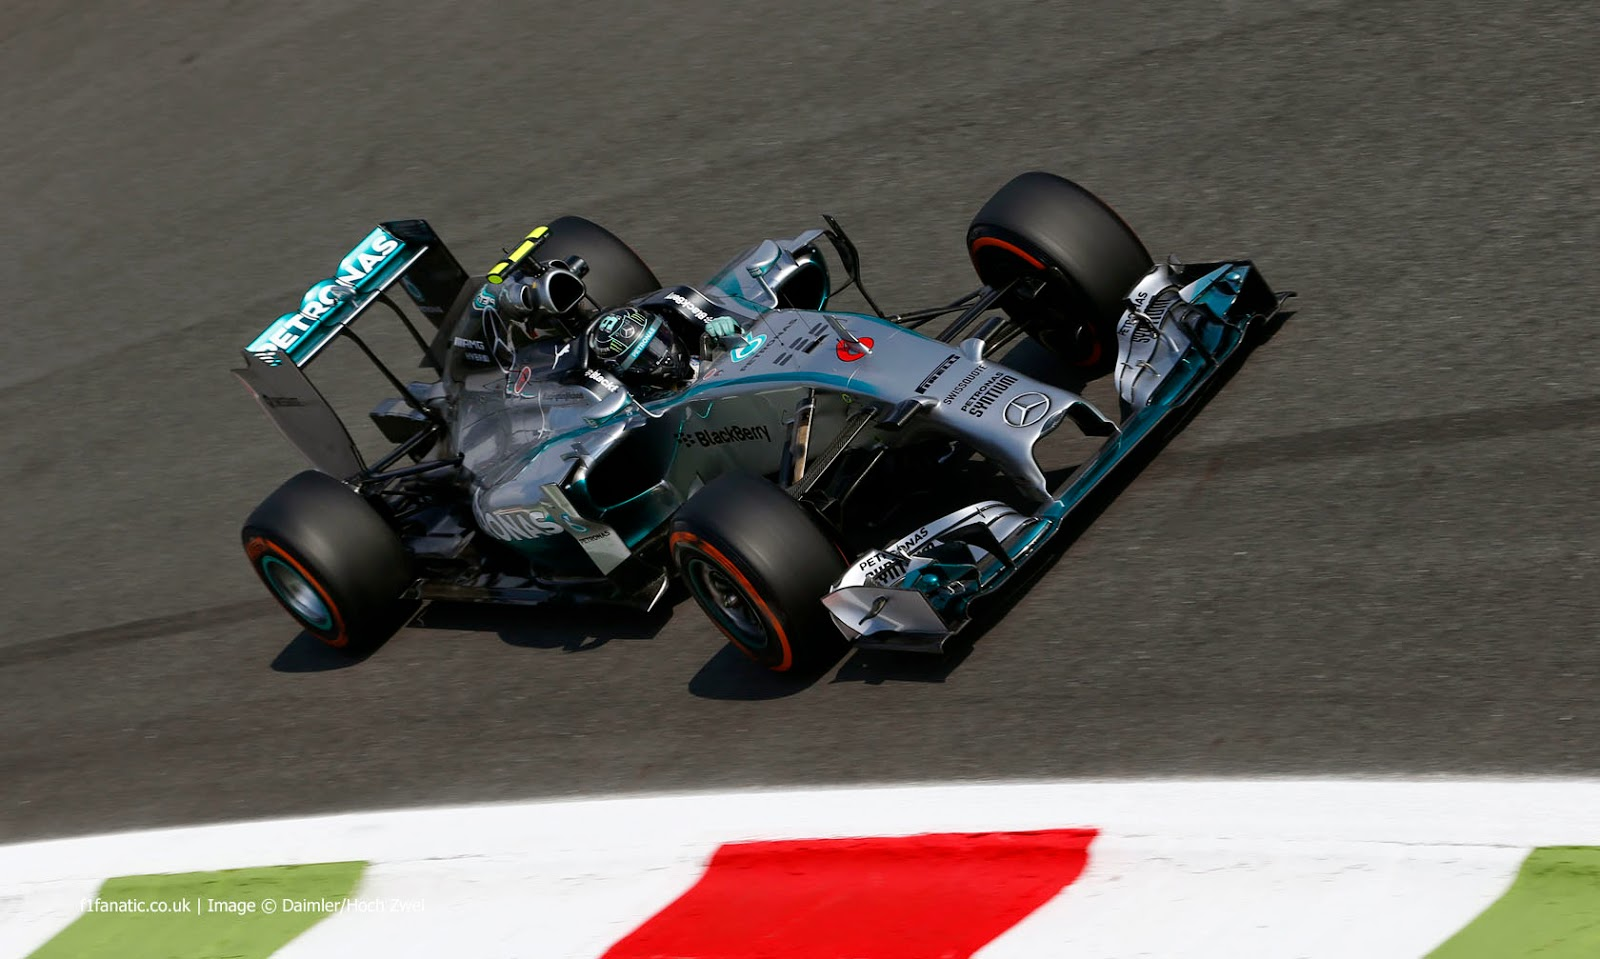 Mercedes Amg Petronas W05 2014 F1 Wallpaper  Kfzoom-6342